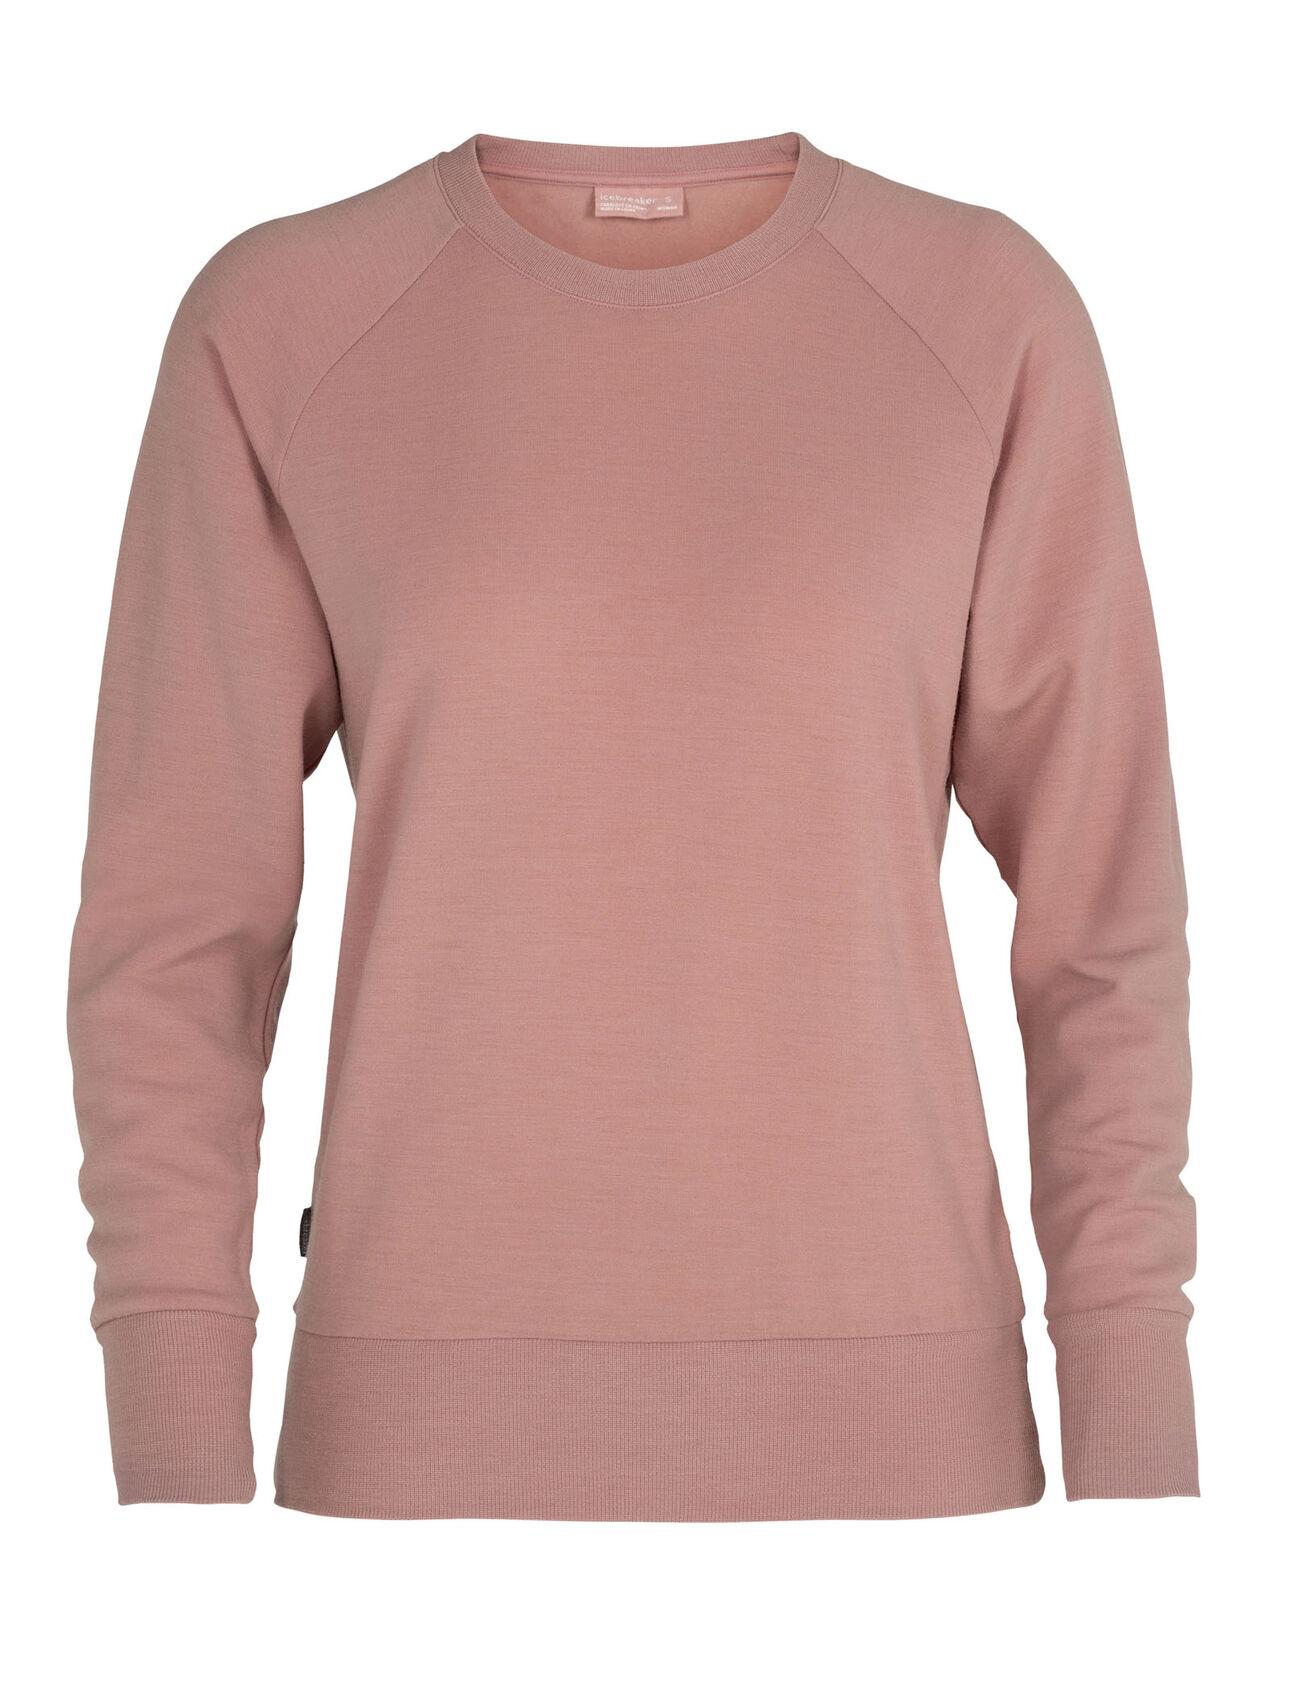 Merino Nature Dye Helliers Long Sleeve Crewe Sweatshirt